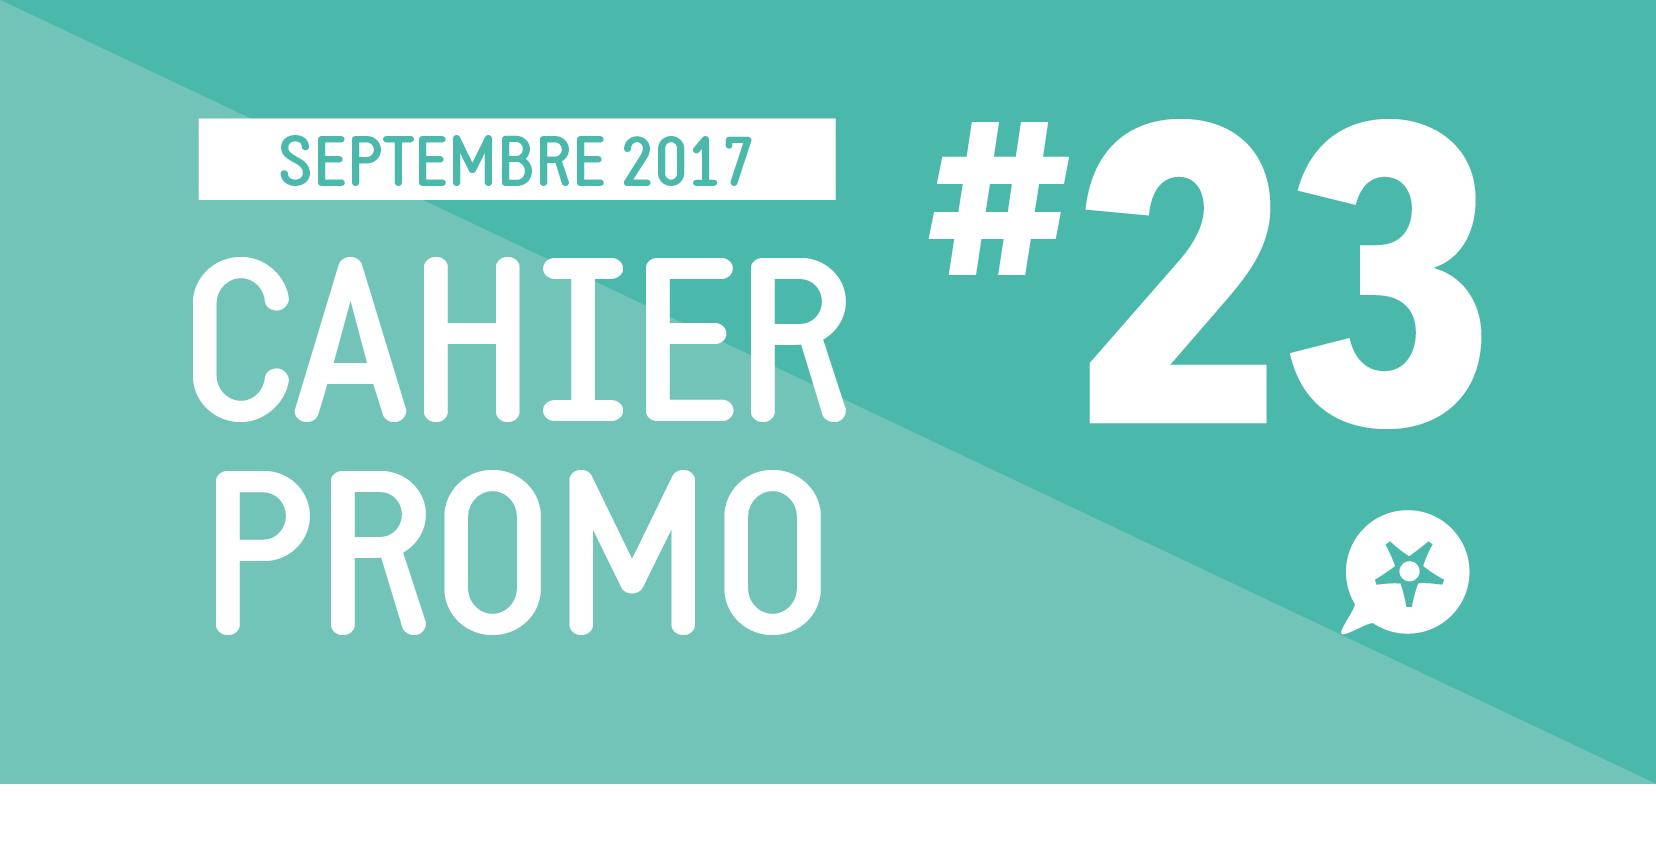 CAHIER PROMO SEPTEMBRE 2017